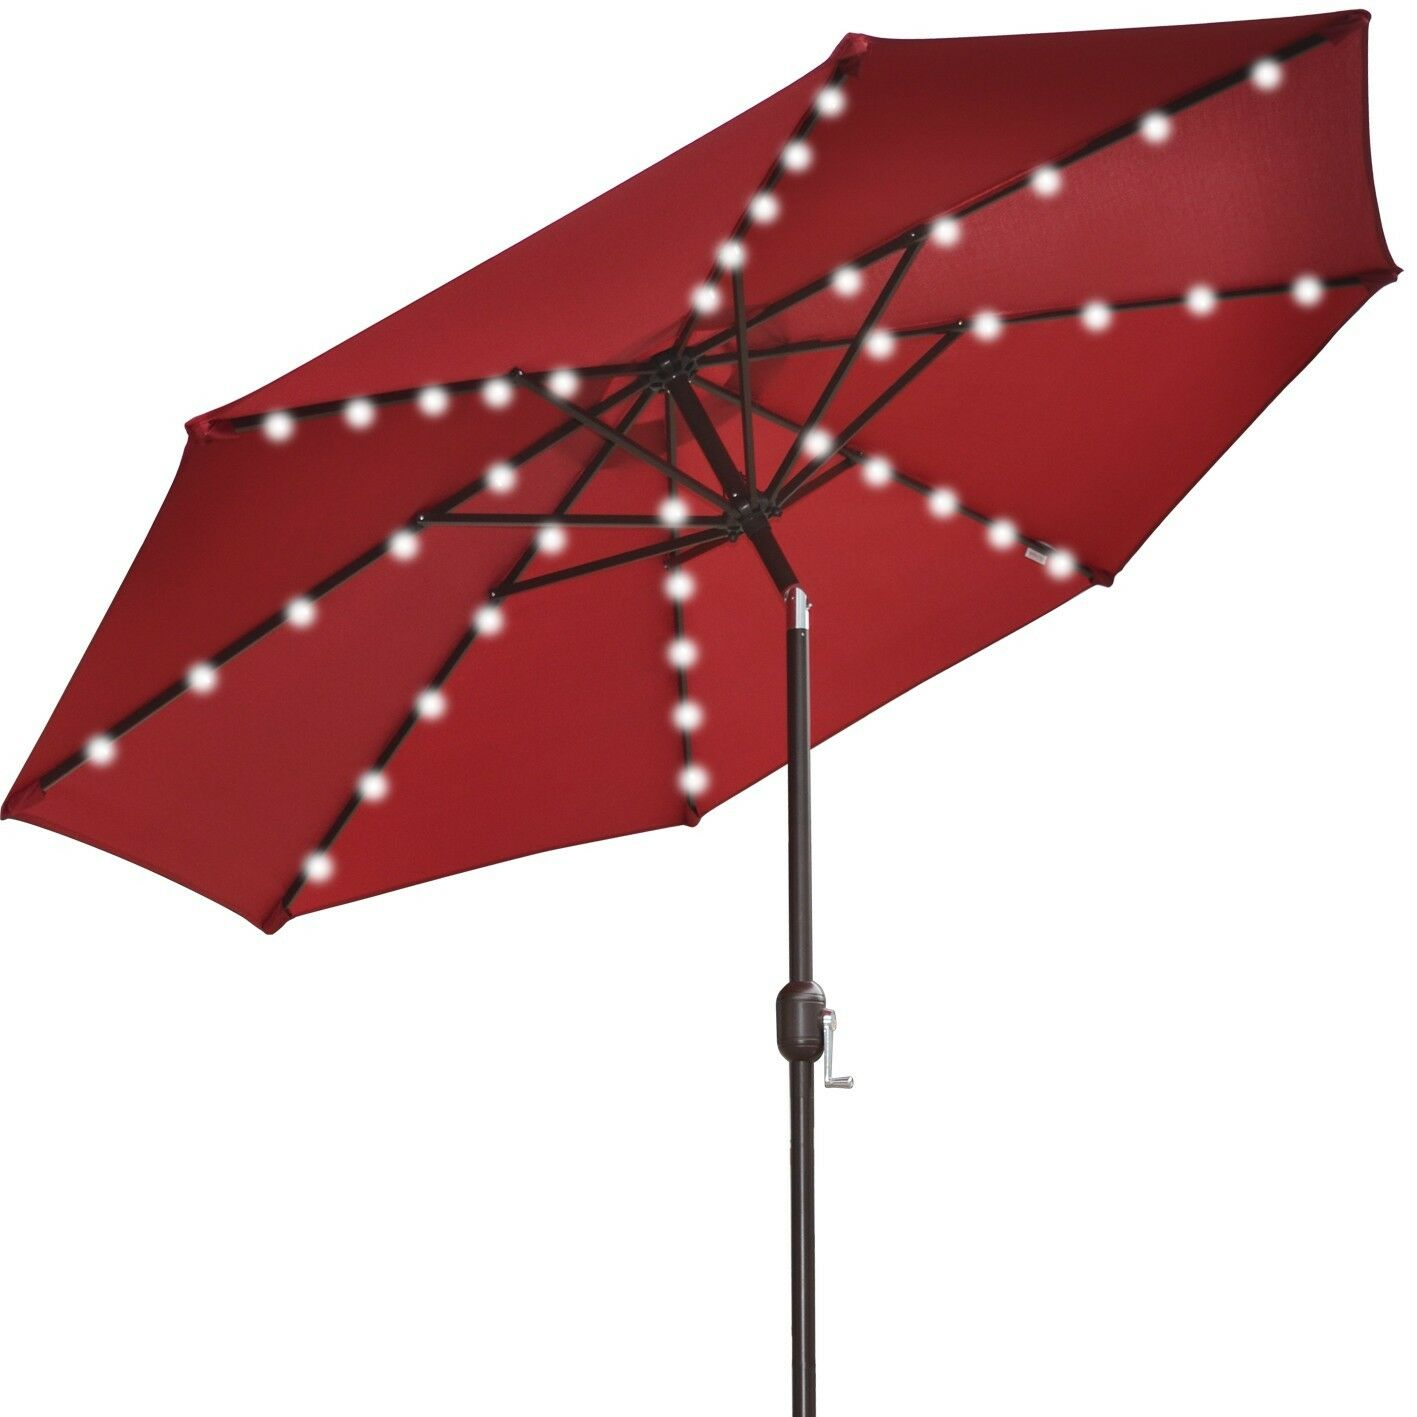 Backyard Umbrella Lights :  Patio Umbrella With Solar Lights in addition Led Canopy Light Canopy